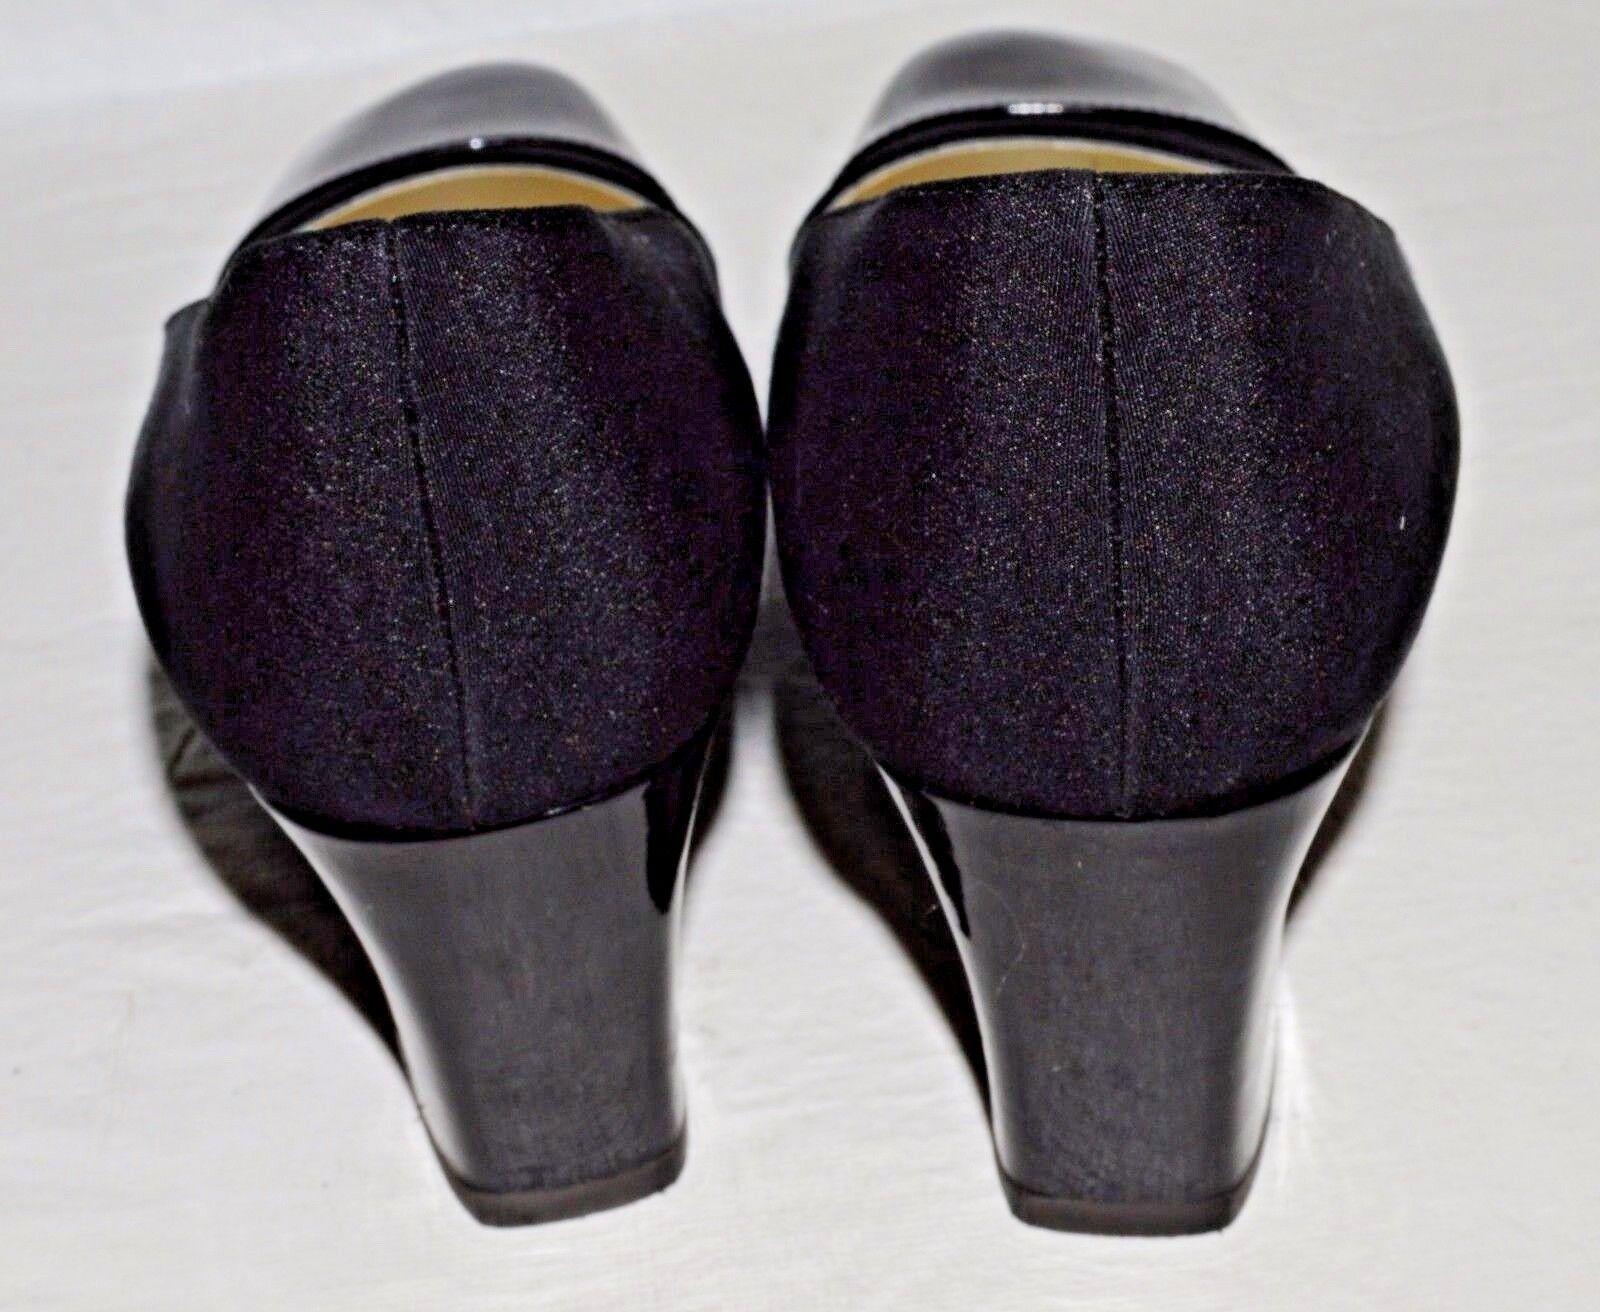 CASADEI NEW VINTAGE SZ LEATHER 7.5 M BLACK PATENT LEATHER SZ FABRIC PUMPS HEELS Schuhe ITALY 186586